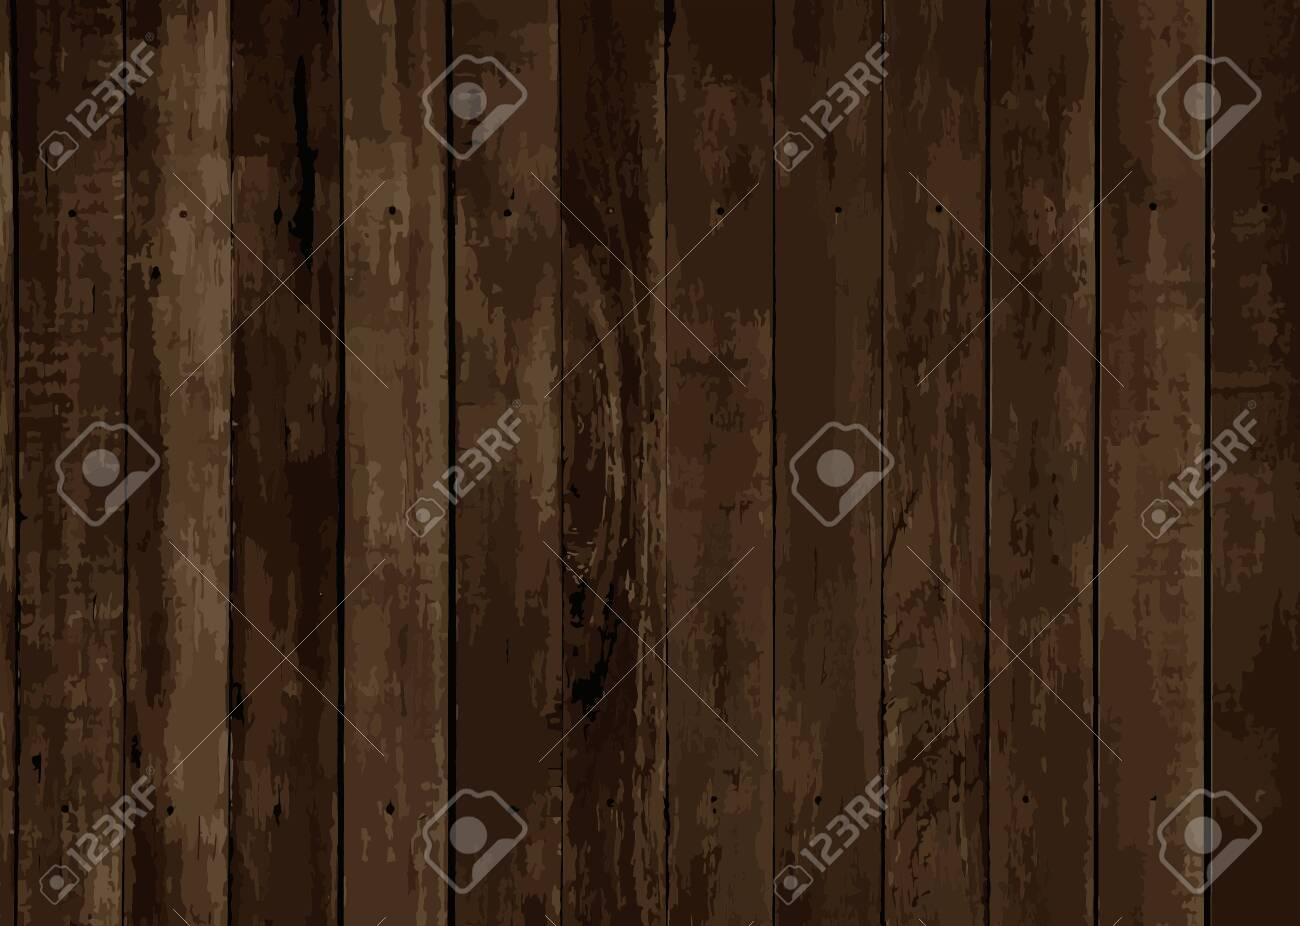 Brown wooden textured background vector - 124142329